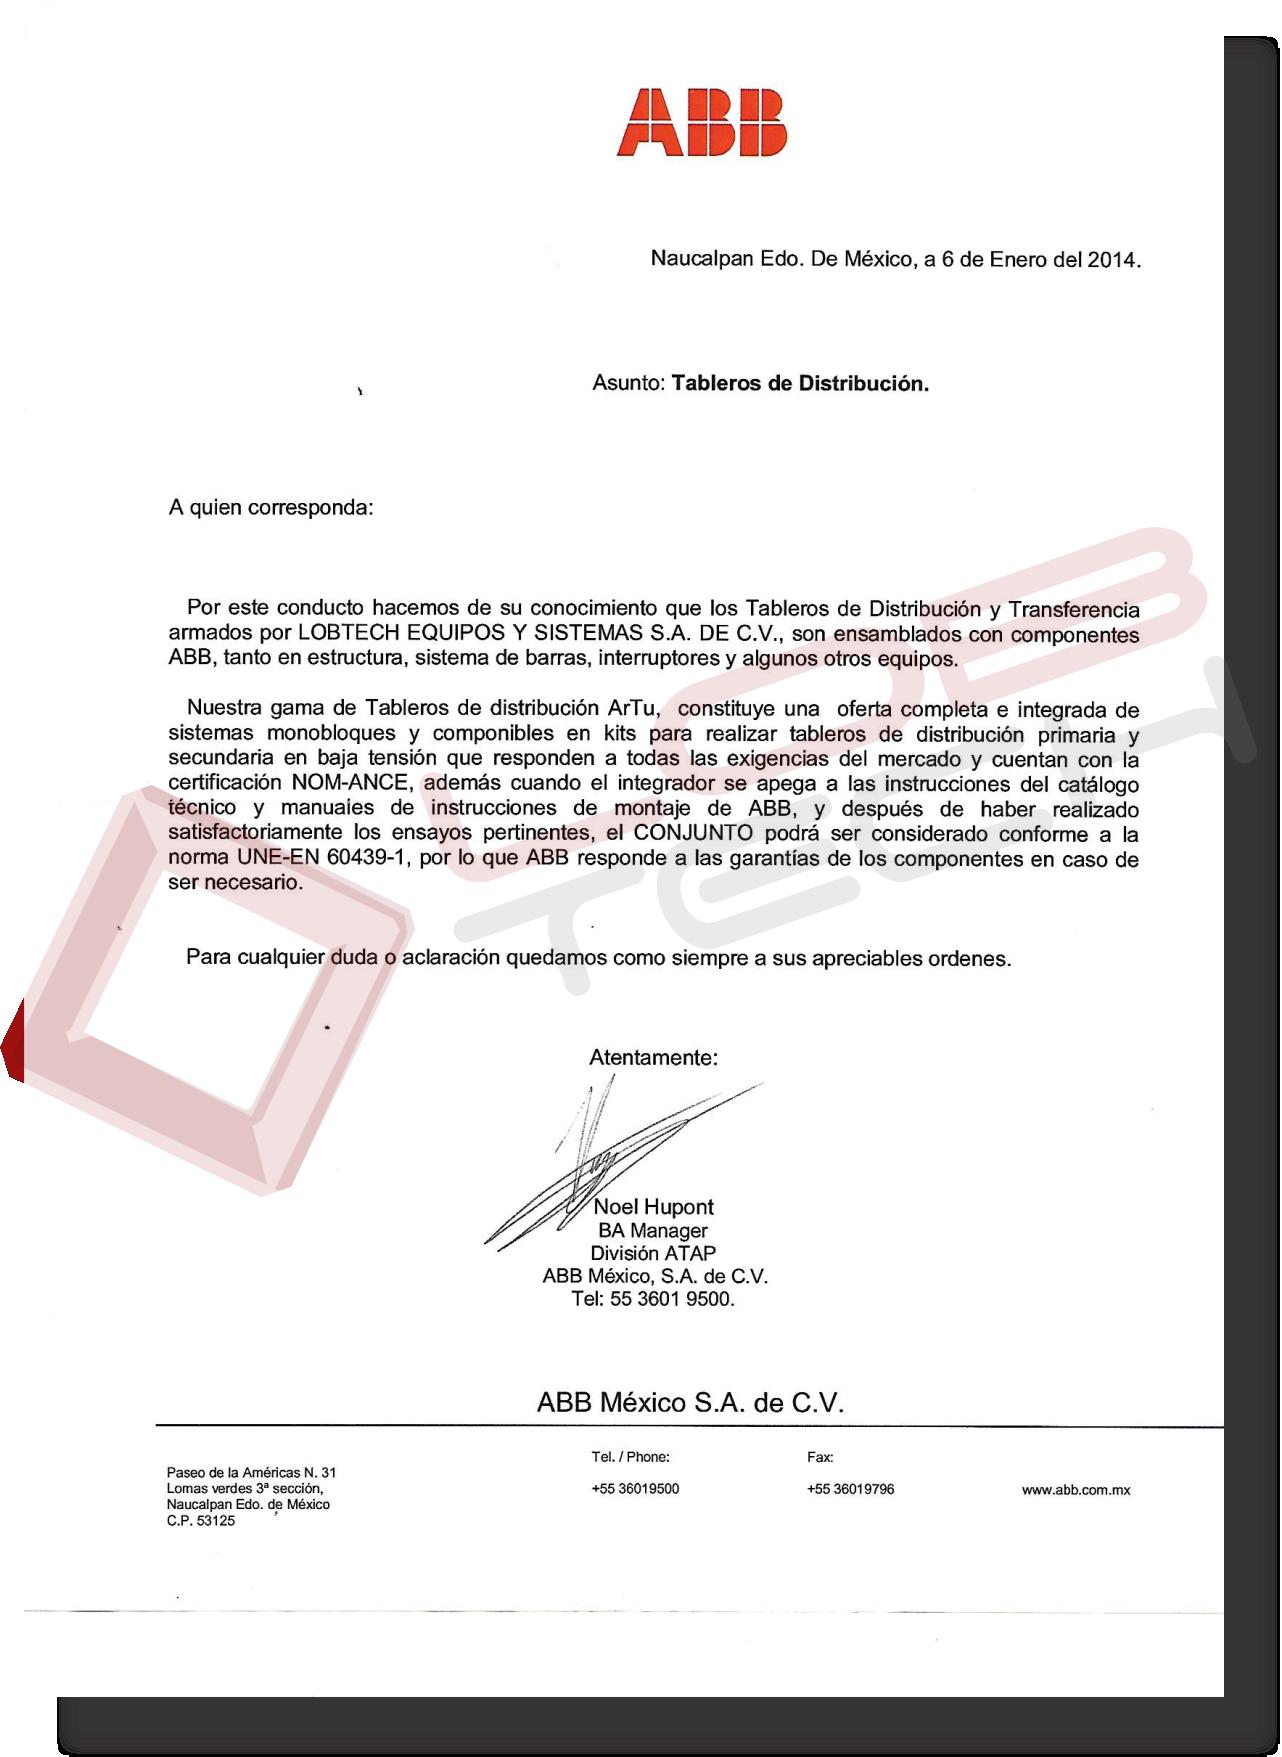 CertificadoABB_1